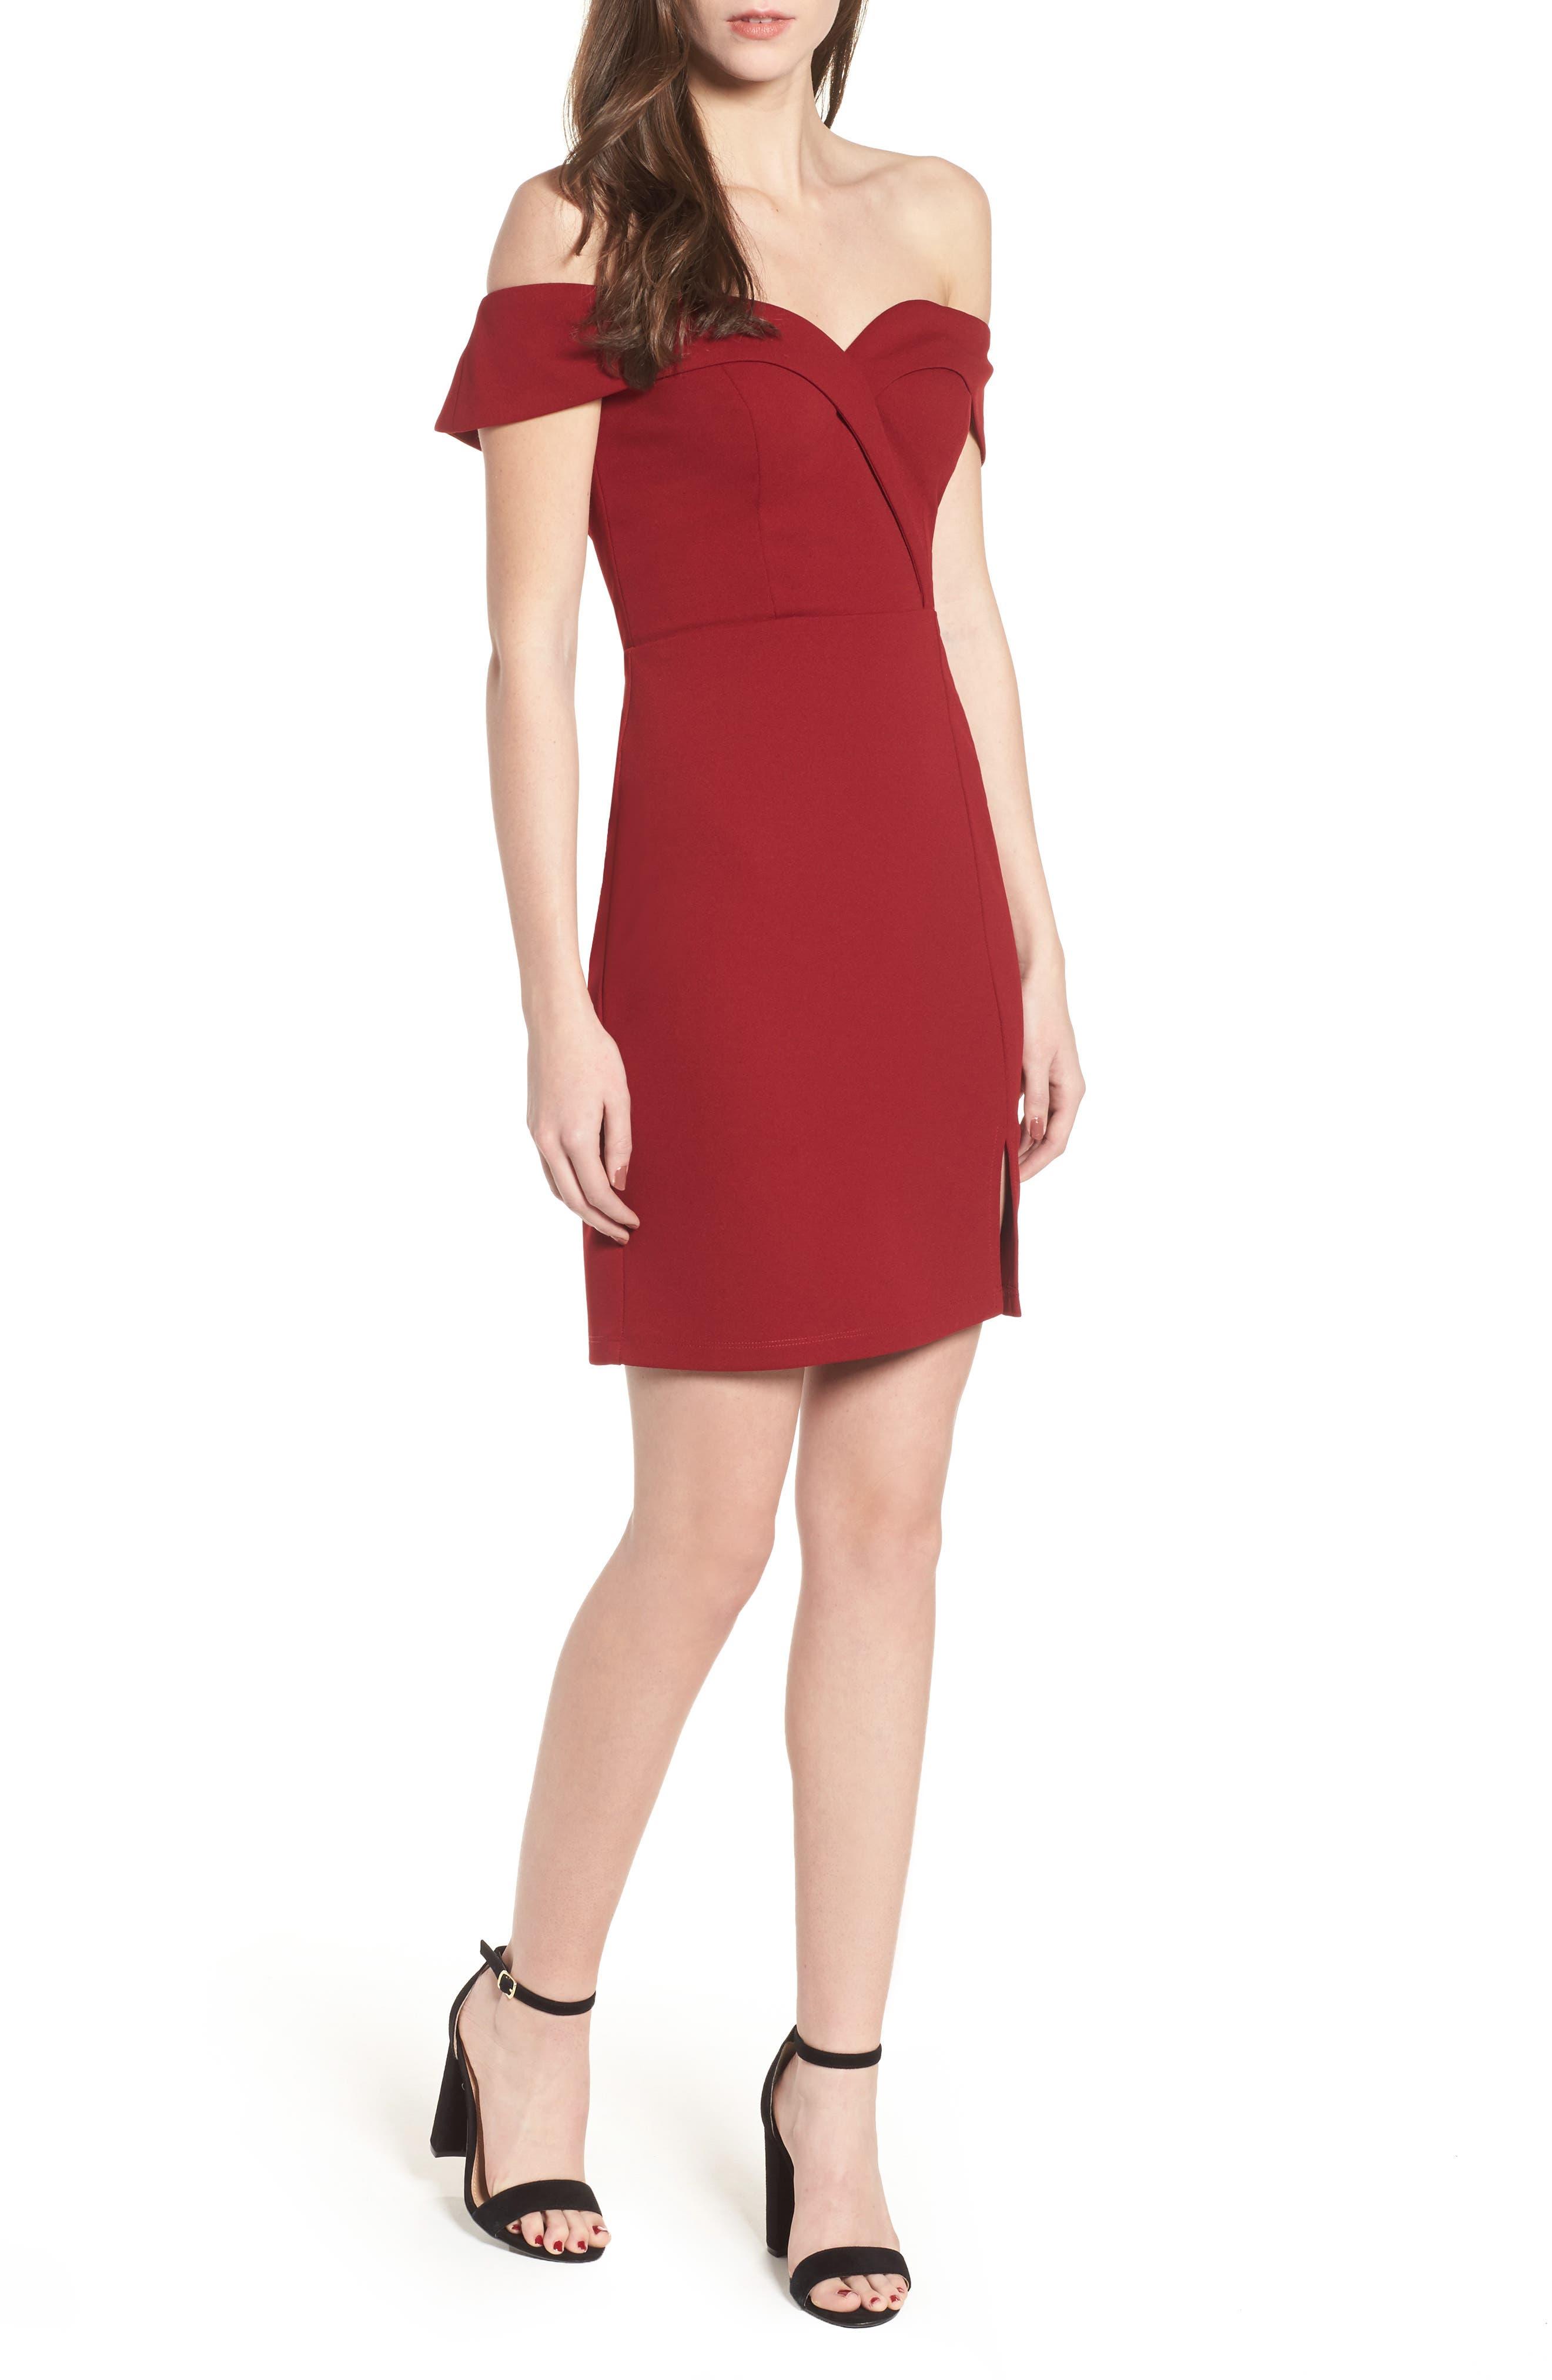 Speechless Off The Shoulder Body-Con Dress, Burgundy